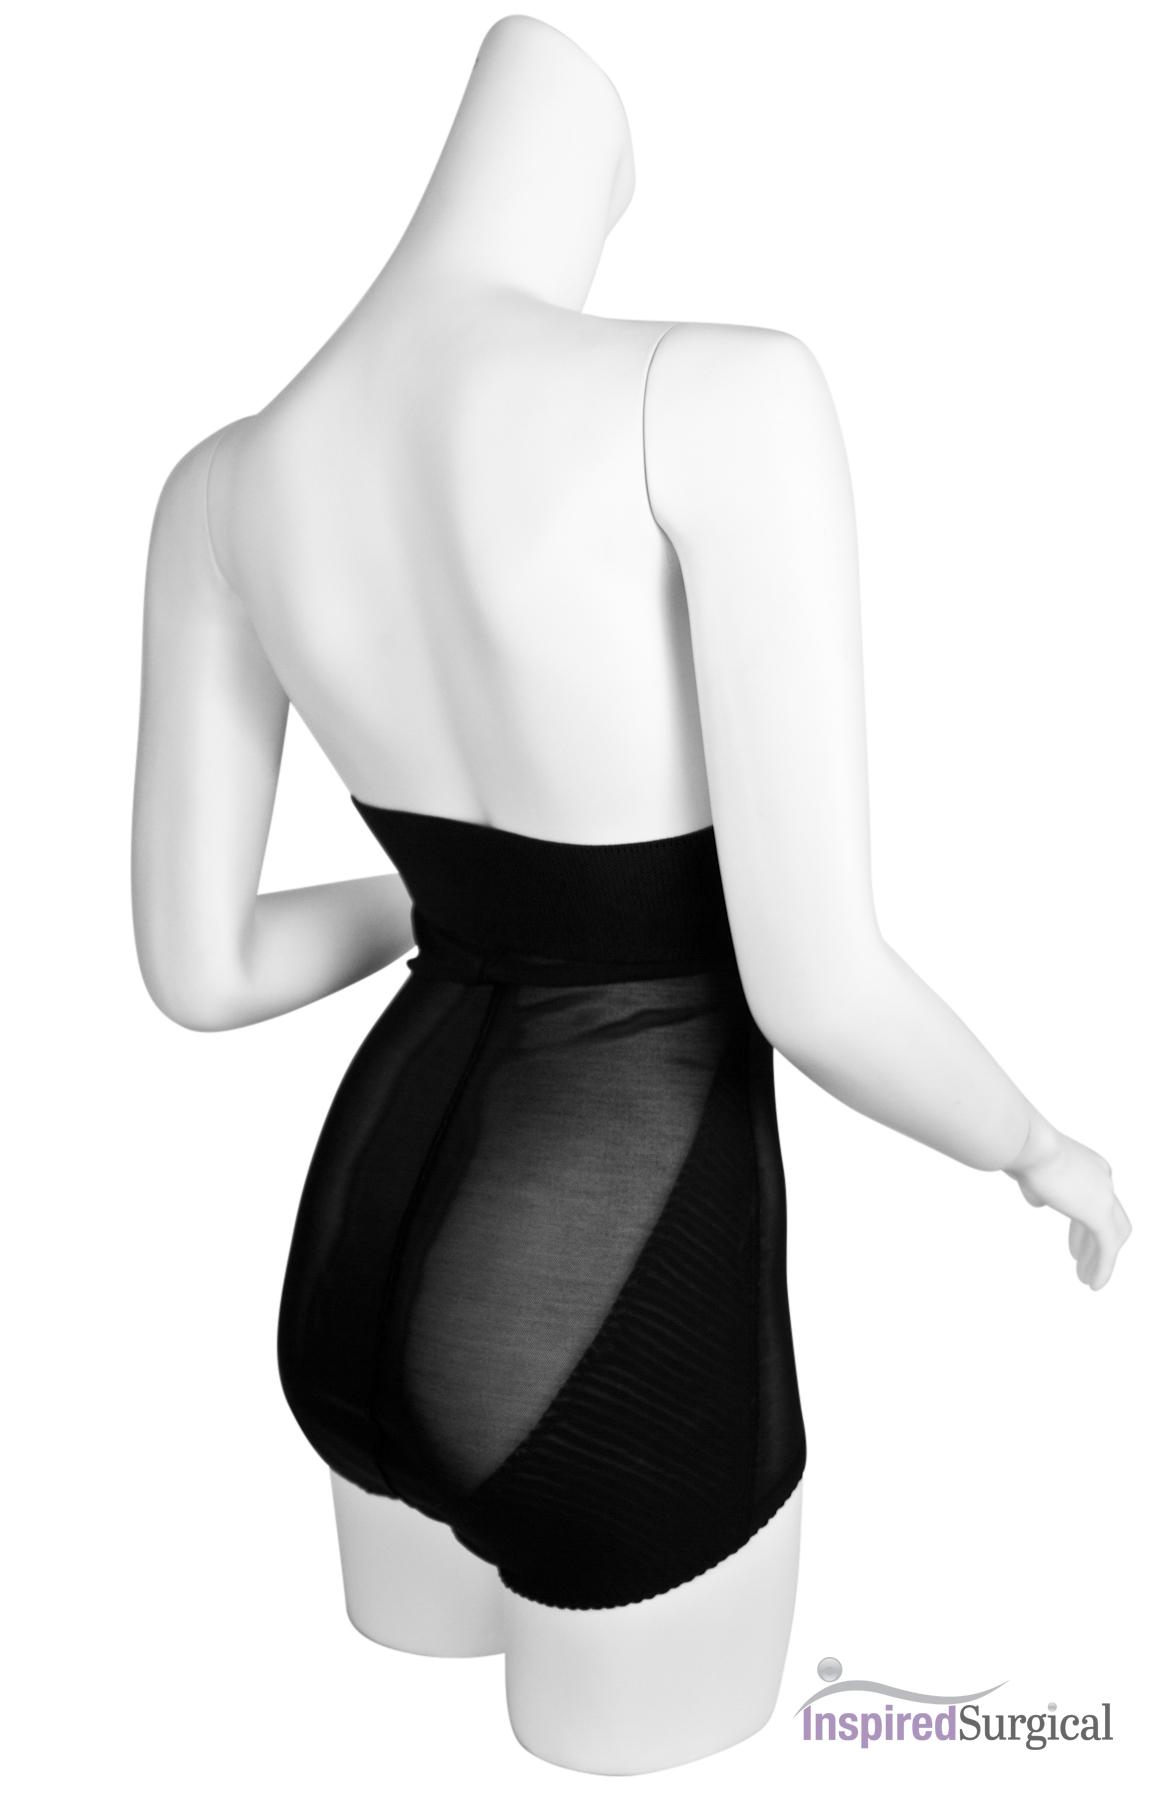 High Waist Panty Style Girdle Compression Garment